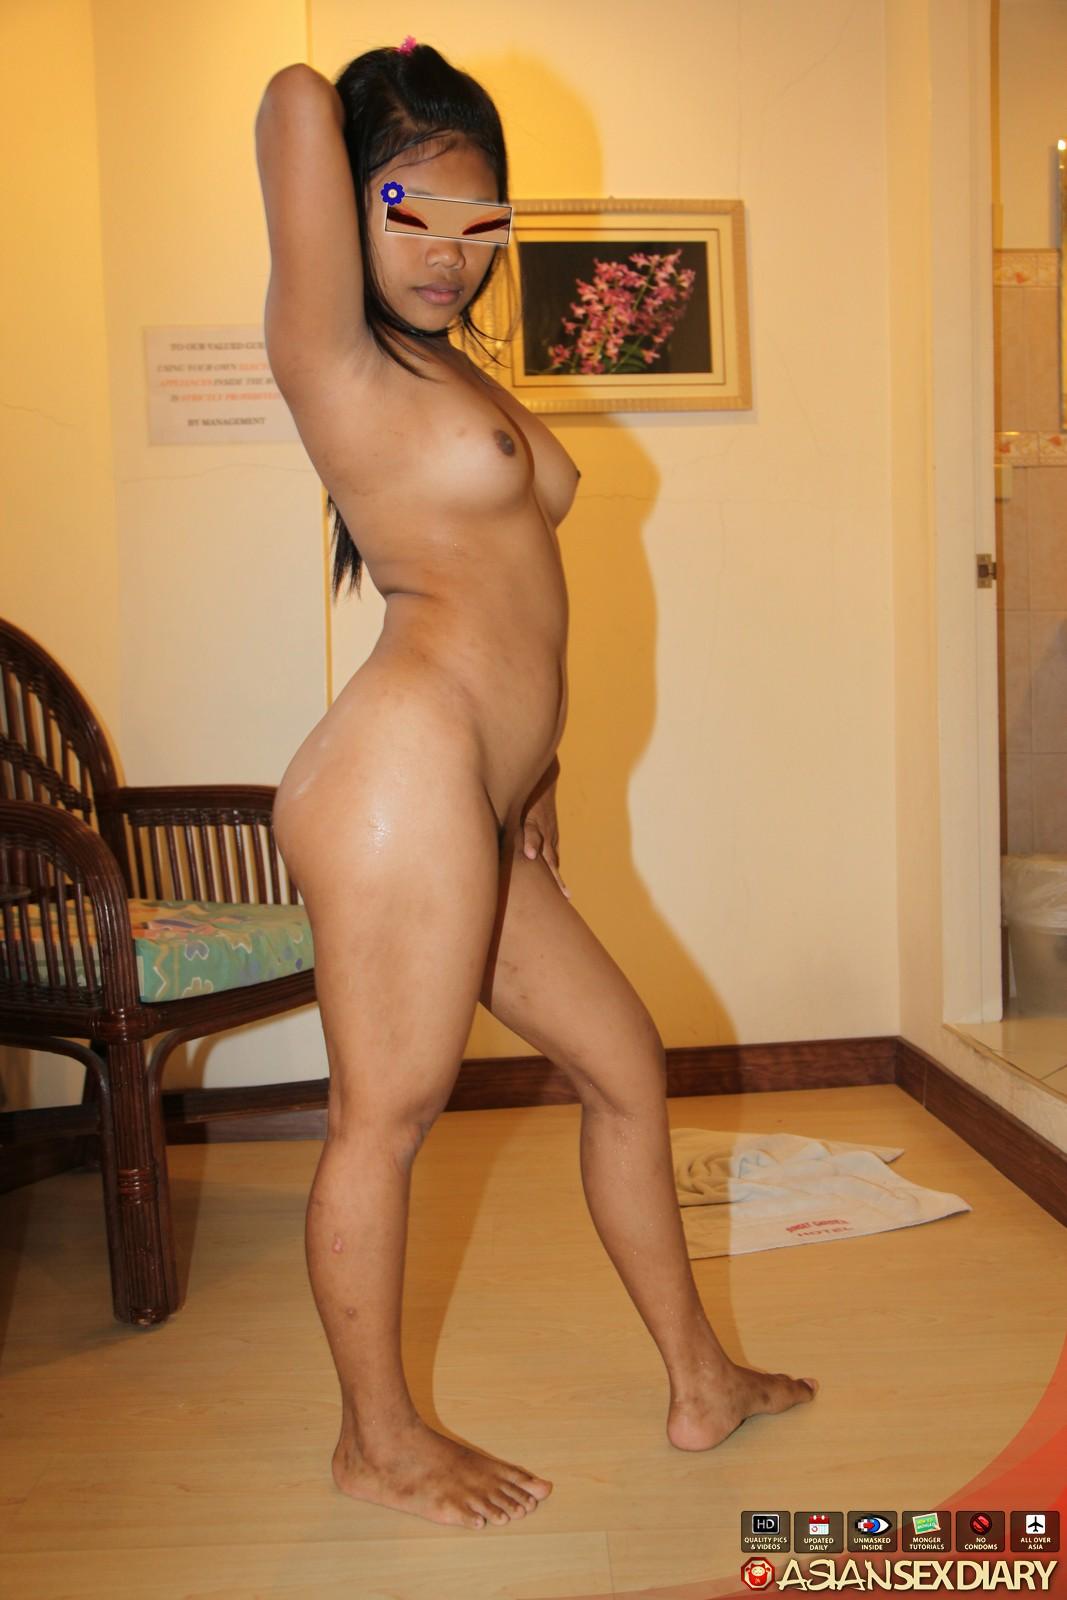 Big tits round ass sex